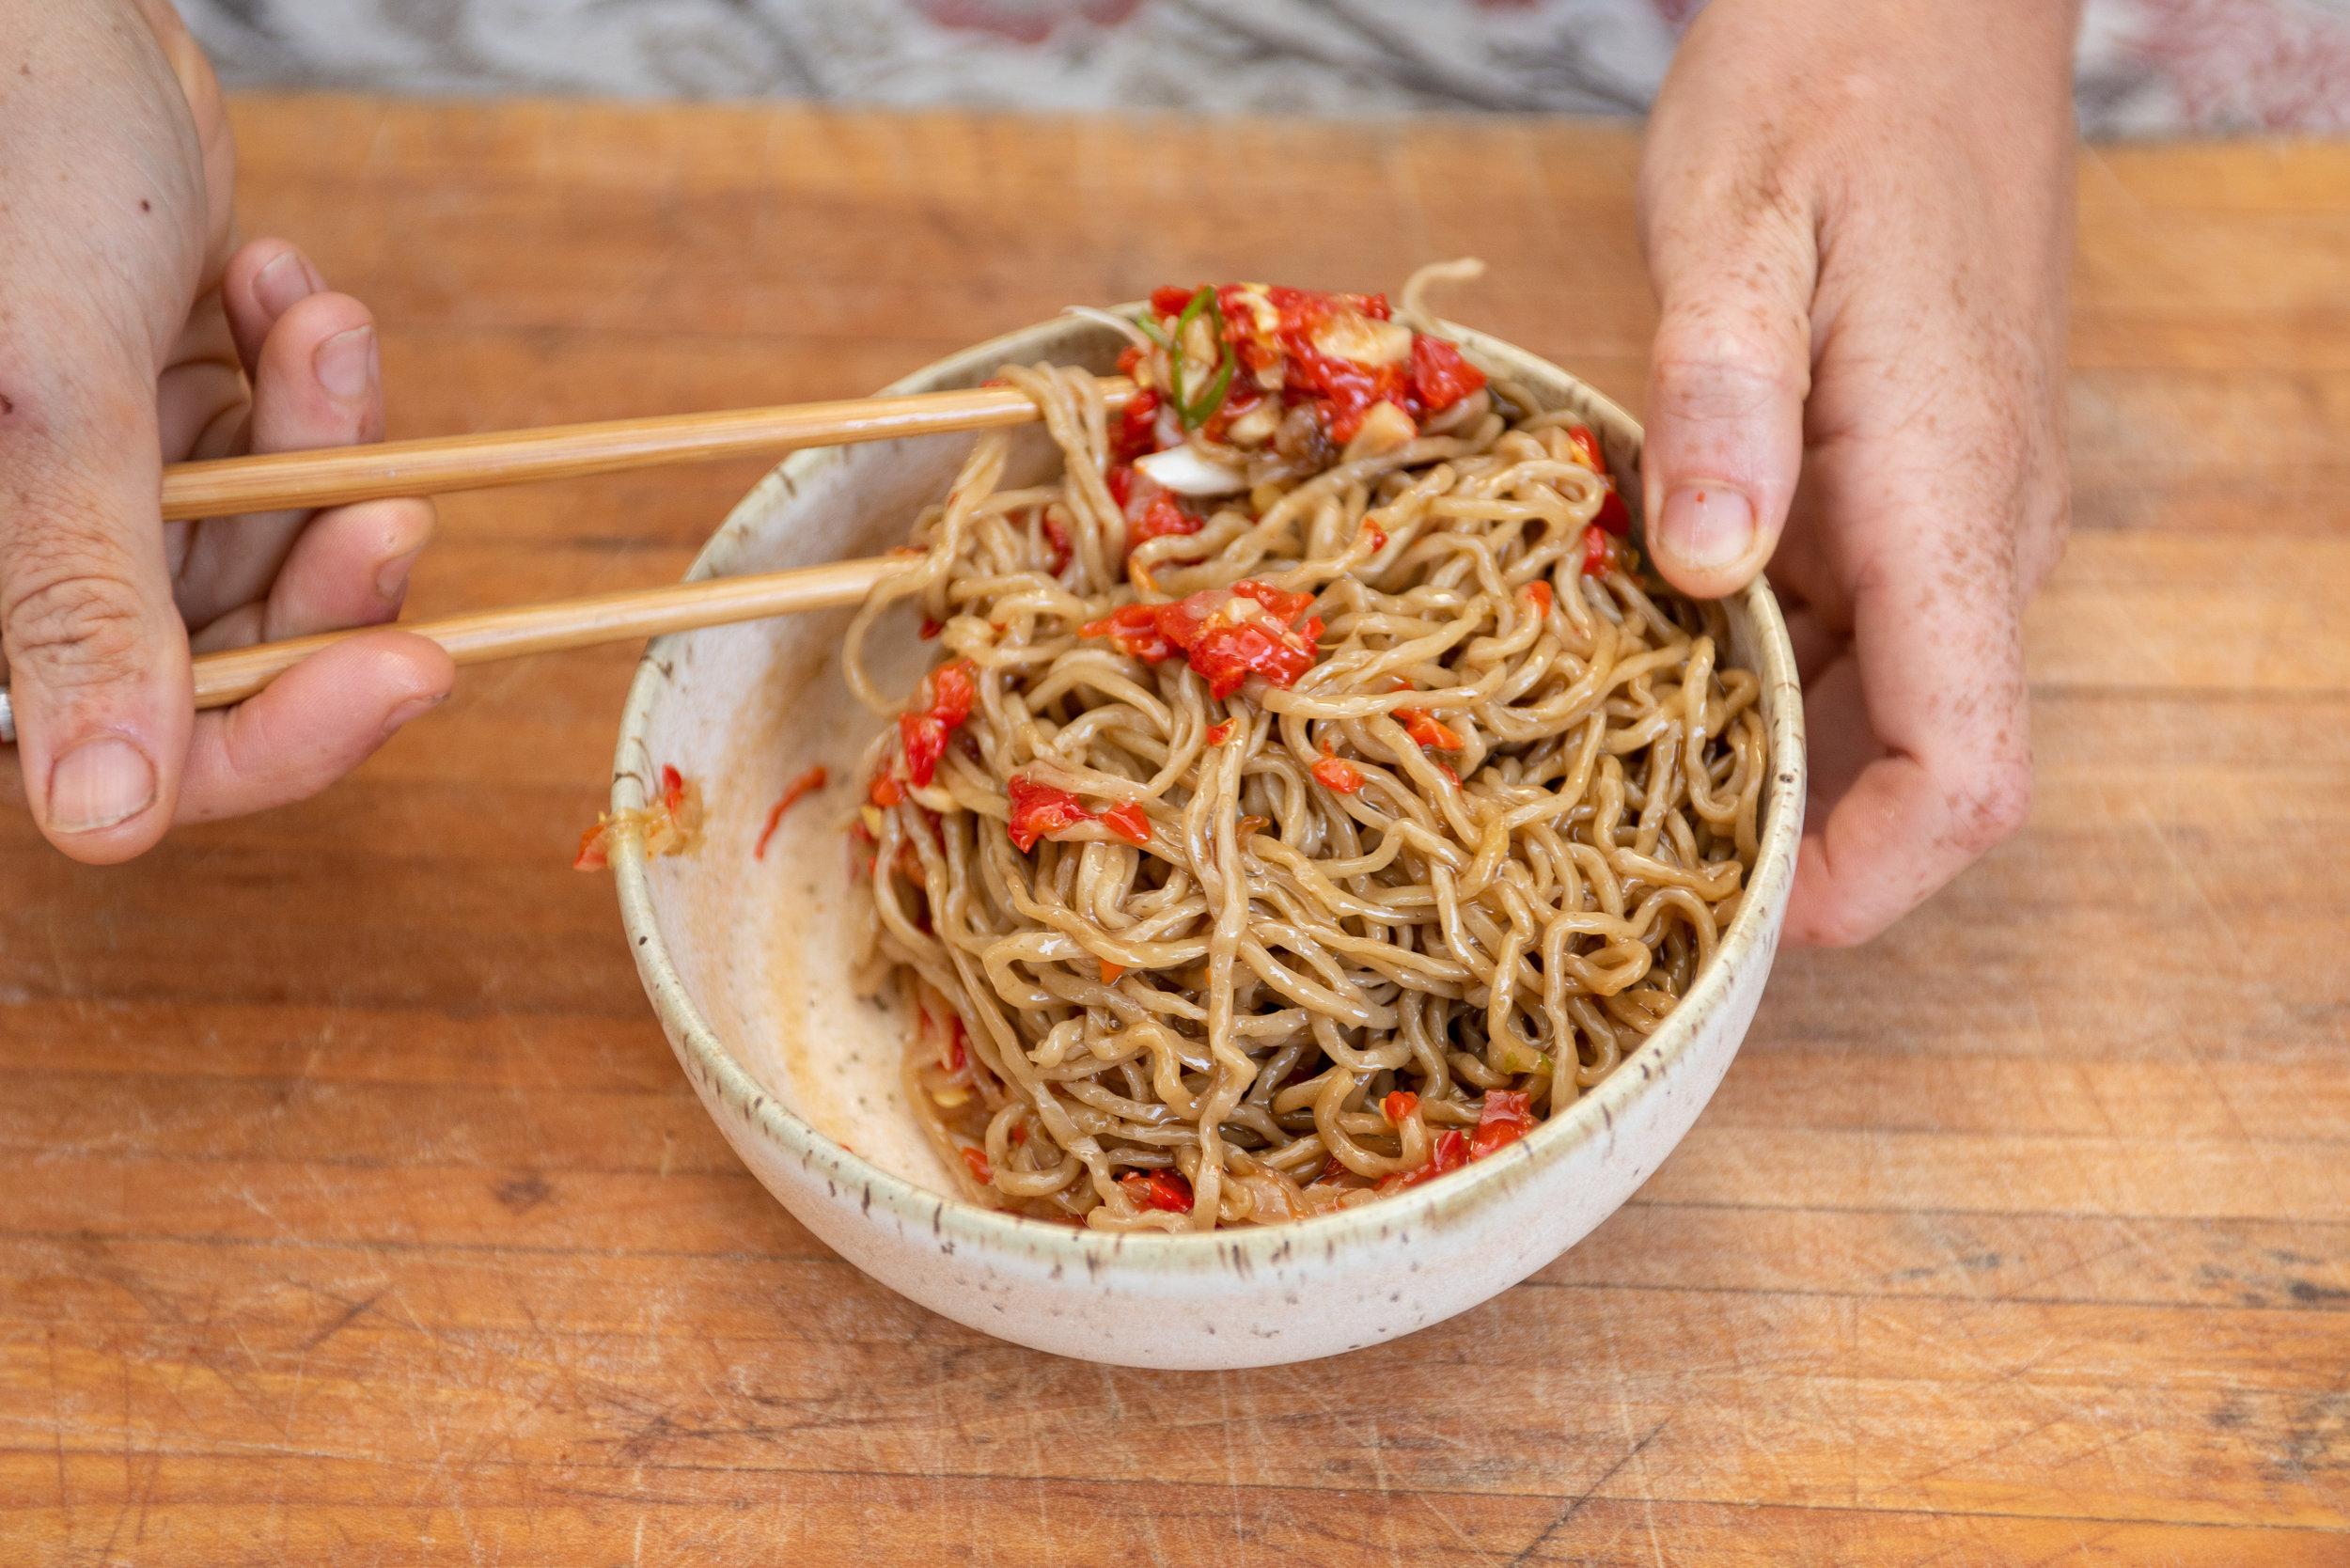 chili garlic noodles-059.jpg